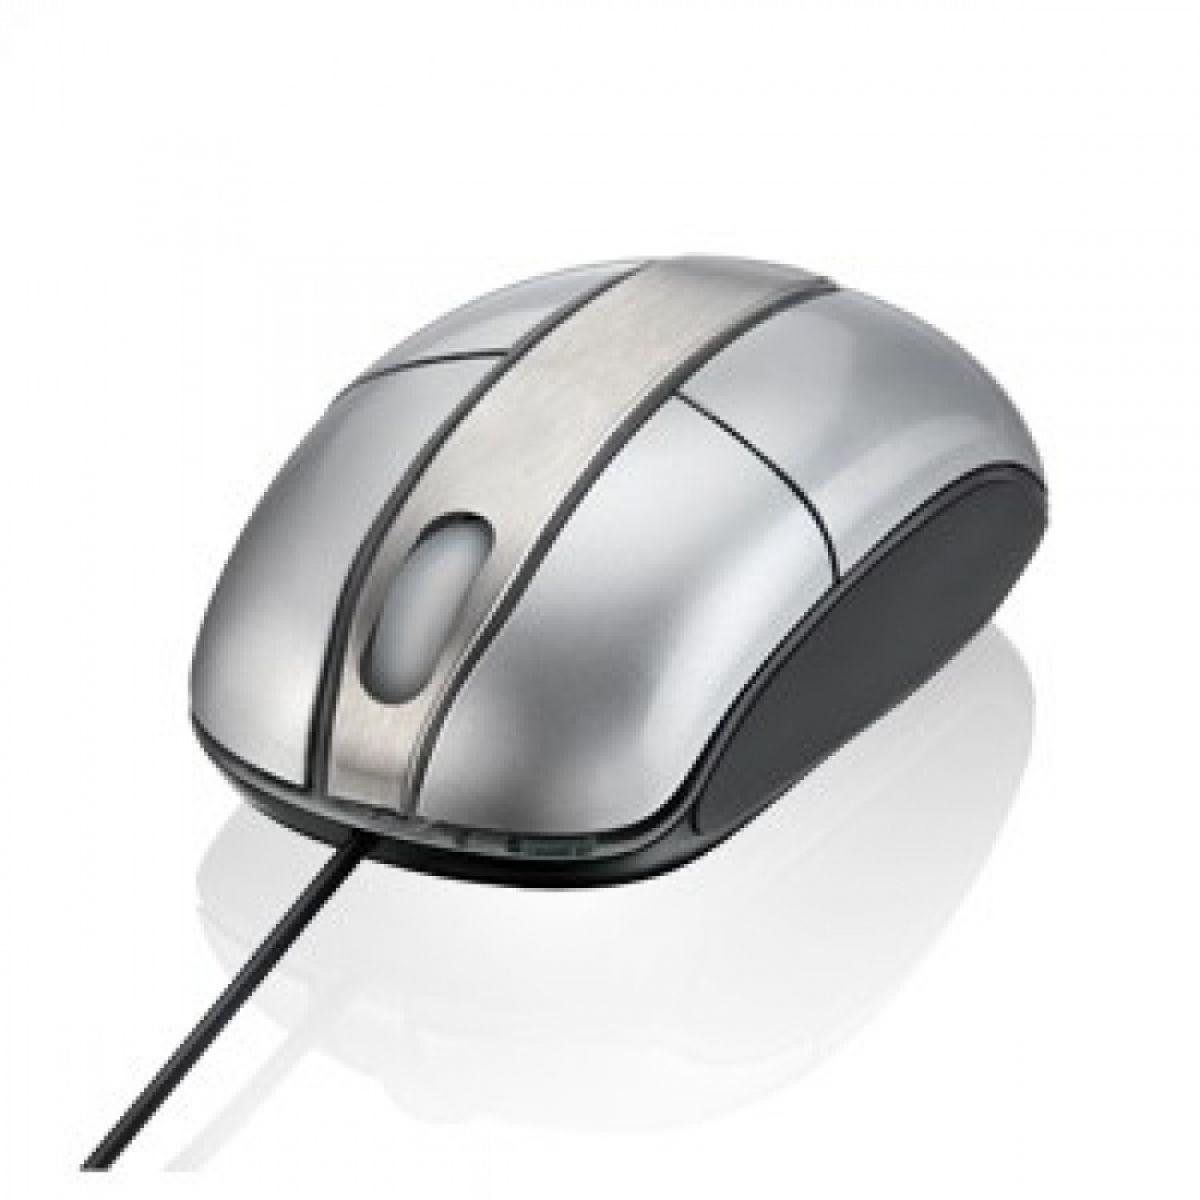 Mouse usb optico prata piano c/ iluminação Multilaser Steel USB MO135